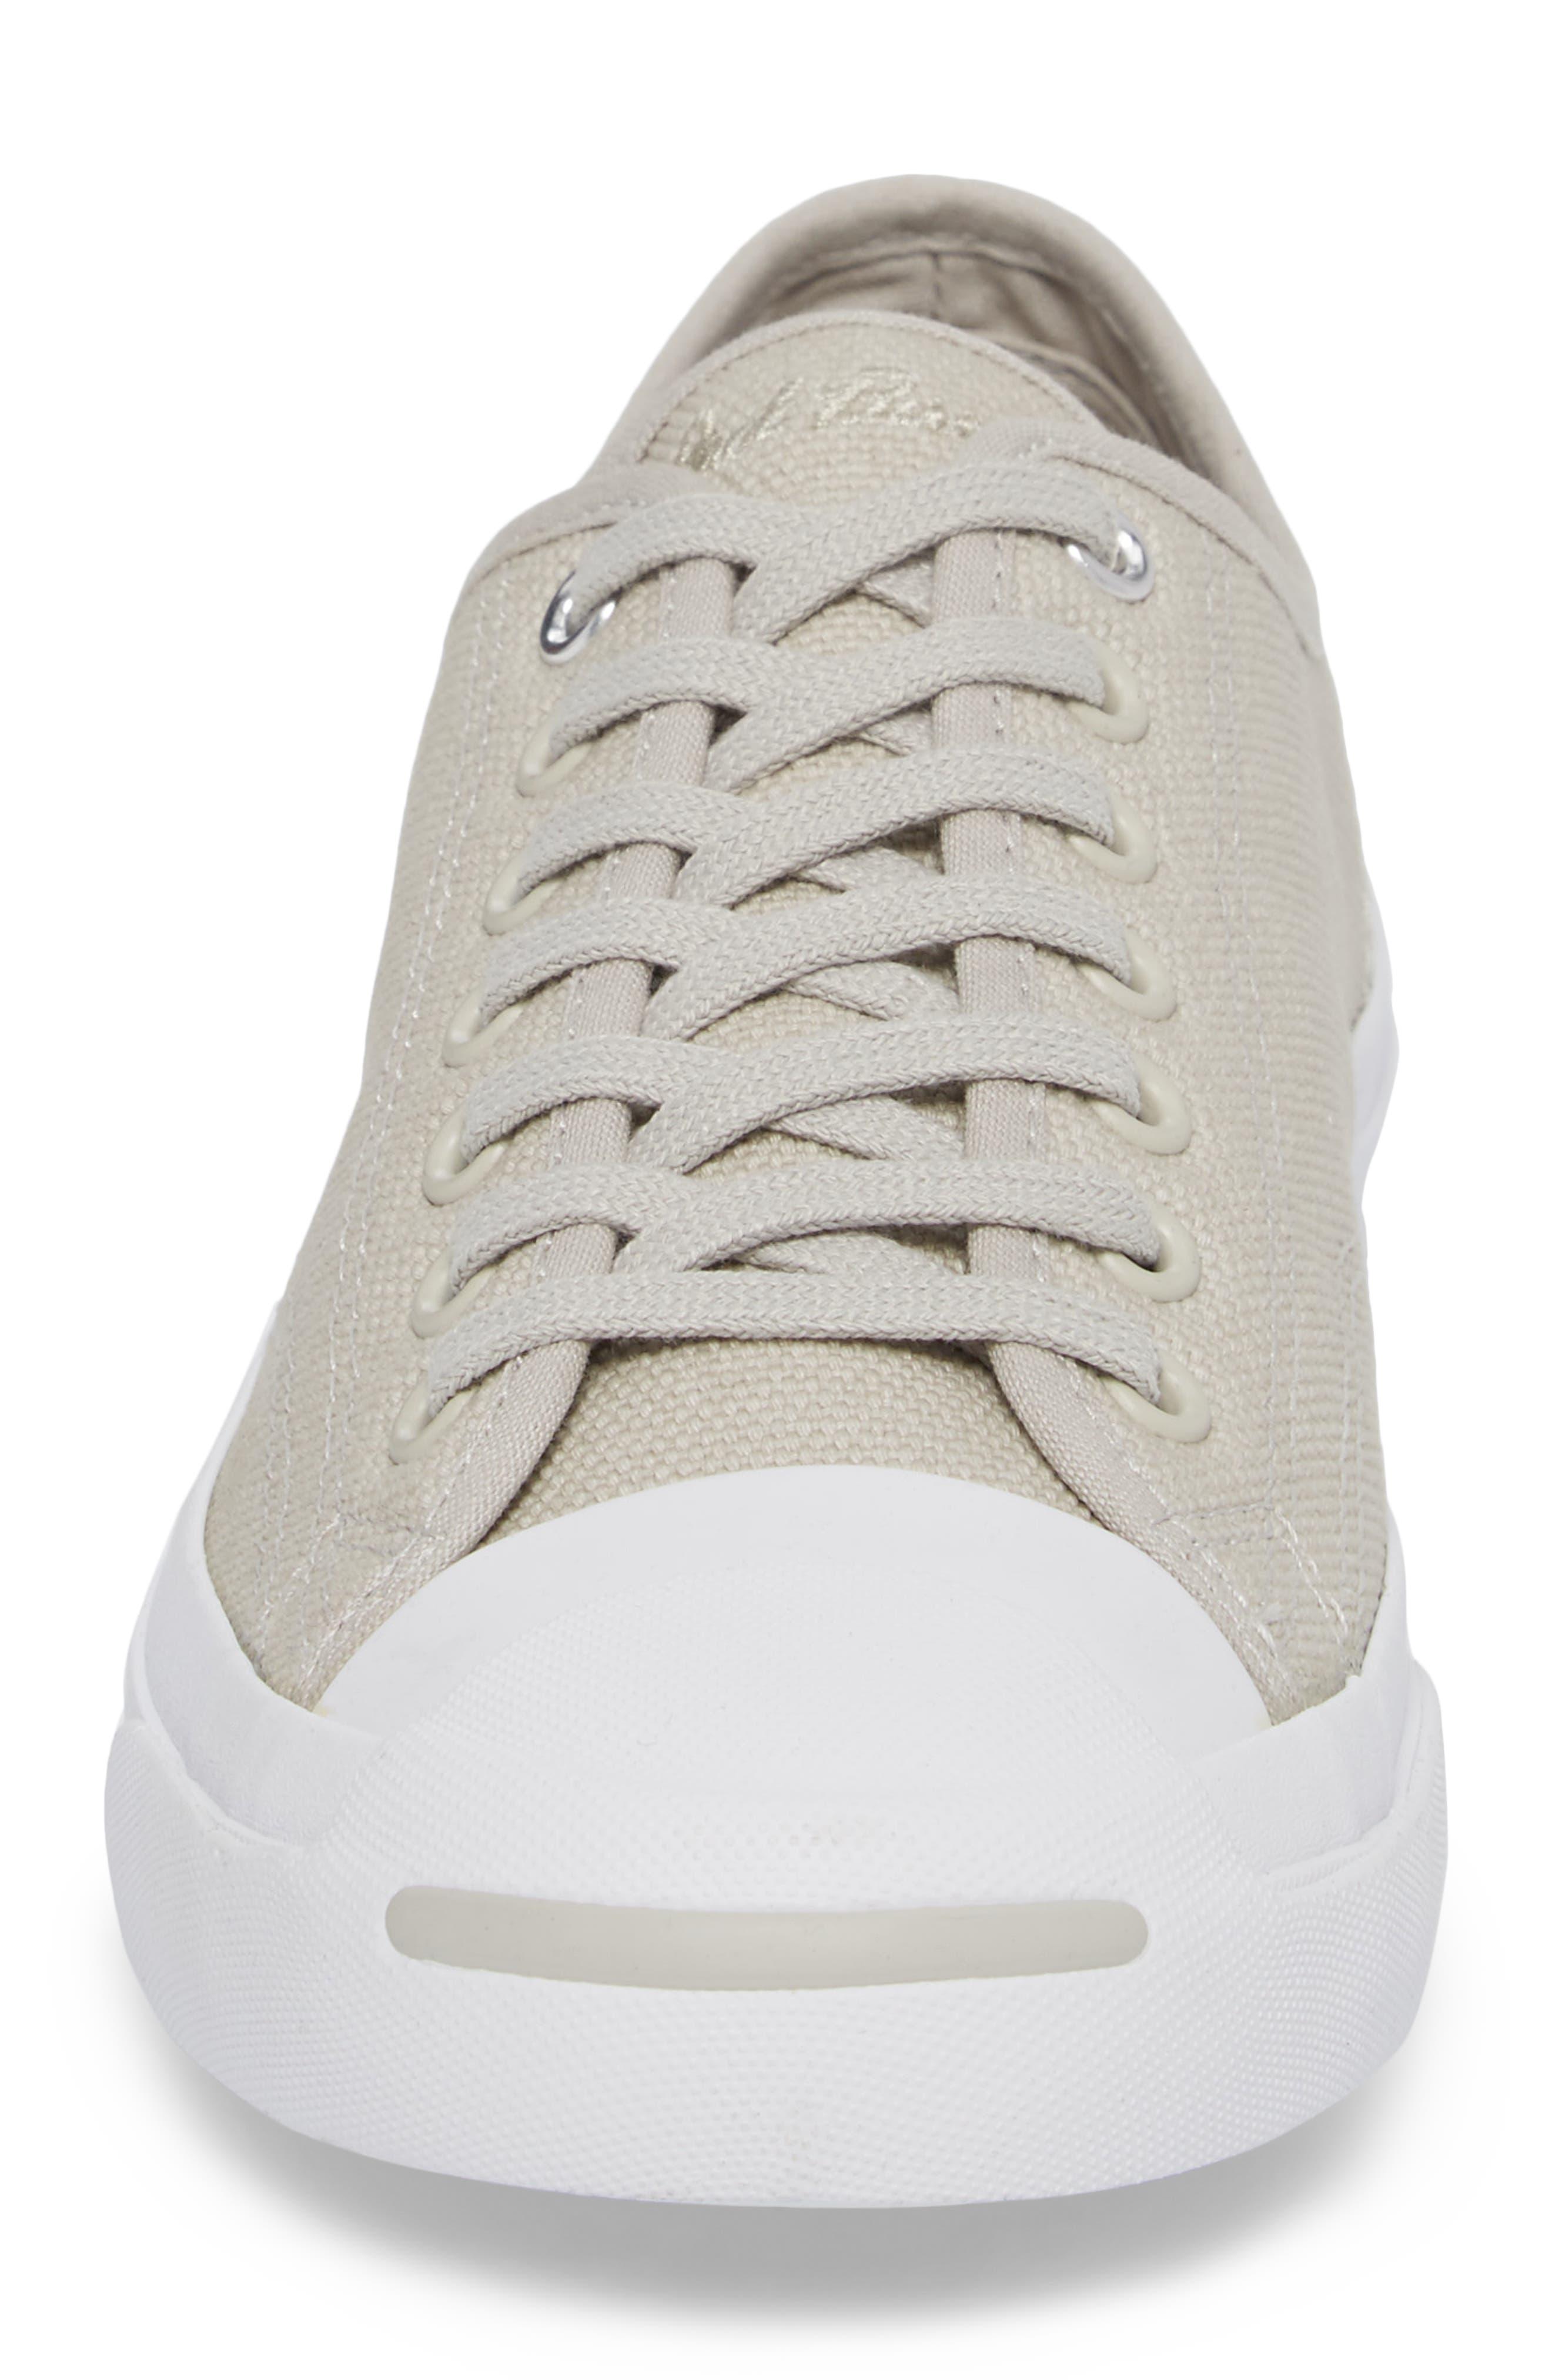 Jack Purcell Sneaker,                             Alternate thumbnail 4, color,                             026